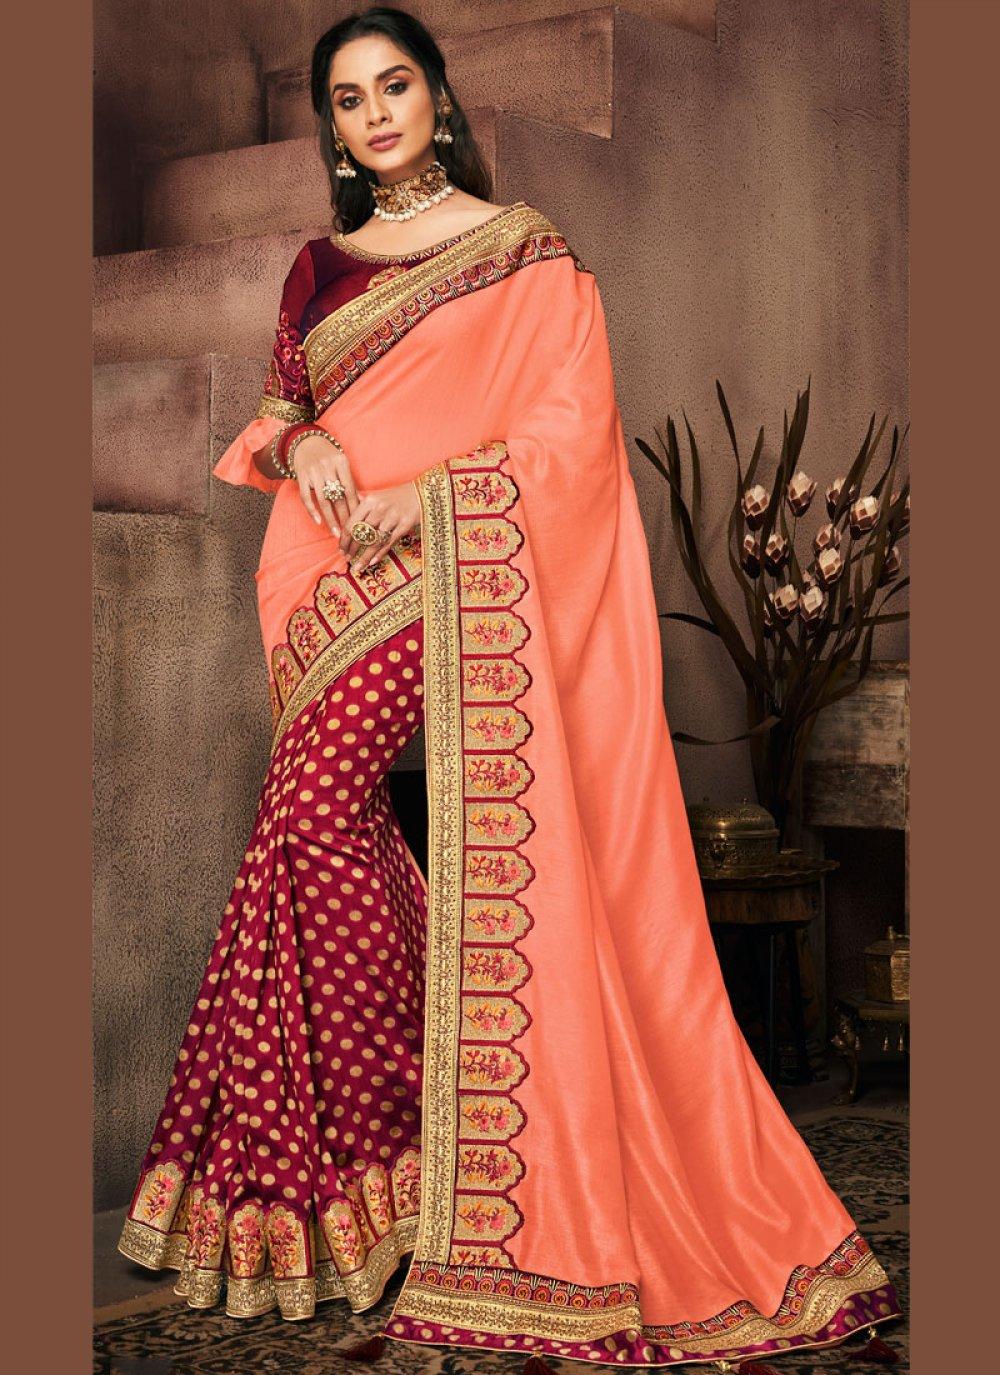 Designer Half N Half Saree Patch Border Art Silk in Maroon and Peach